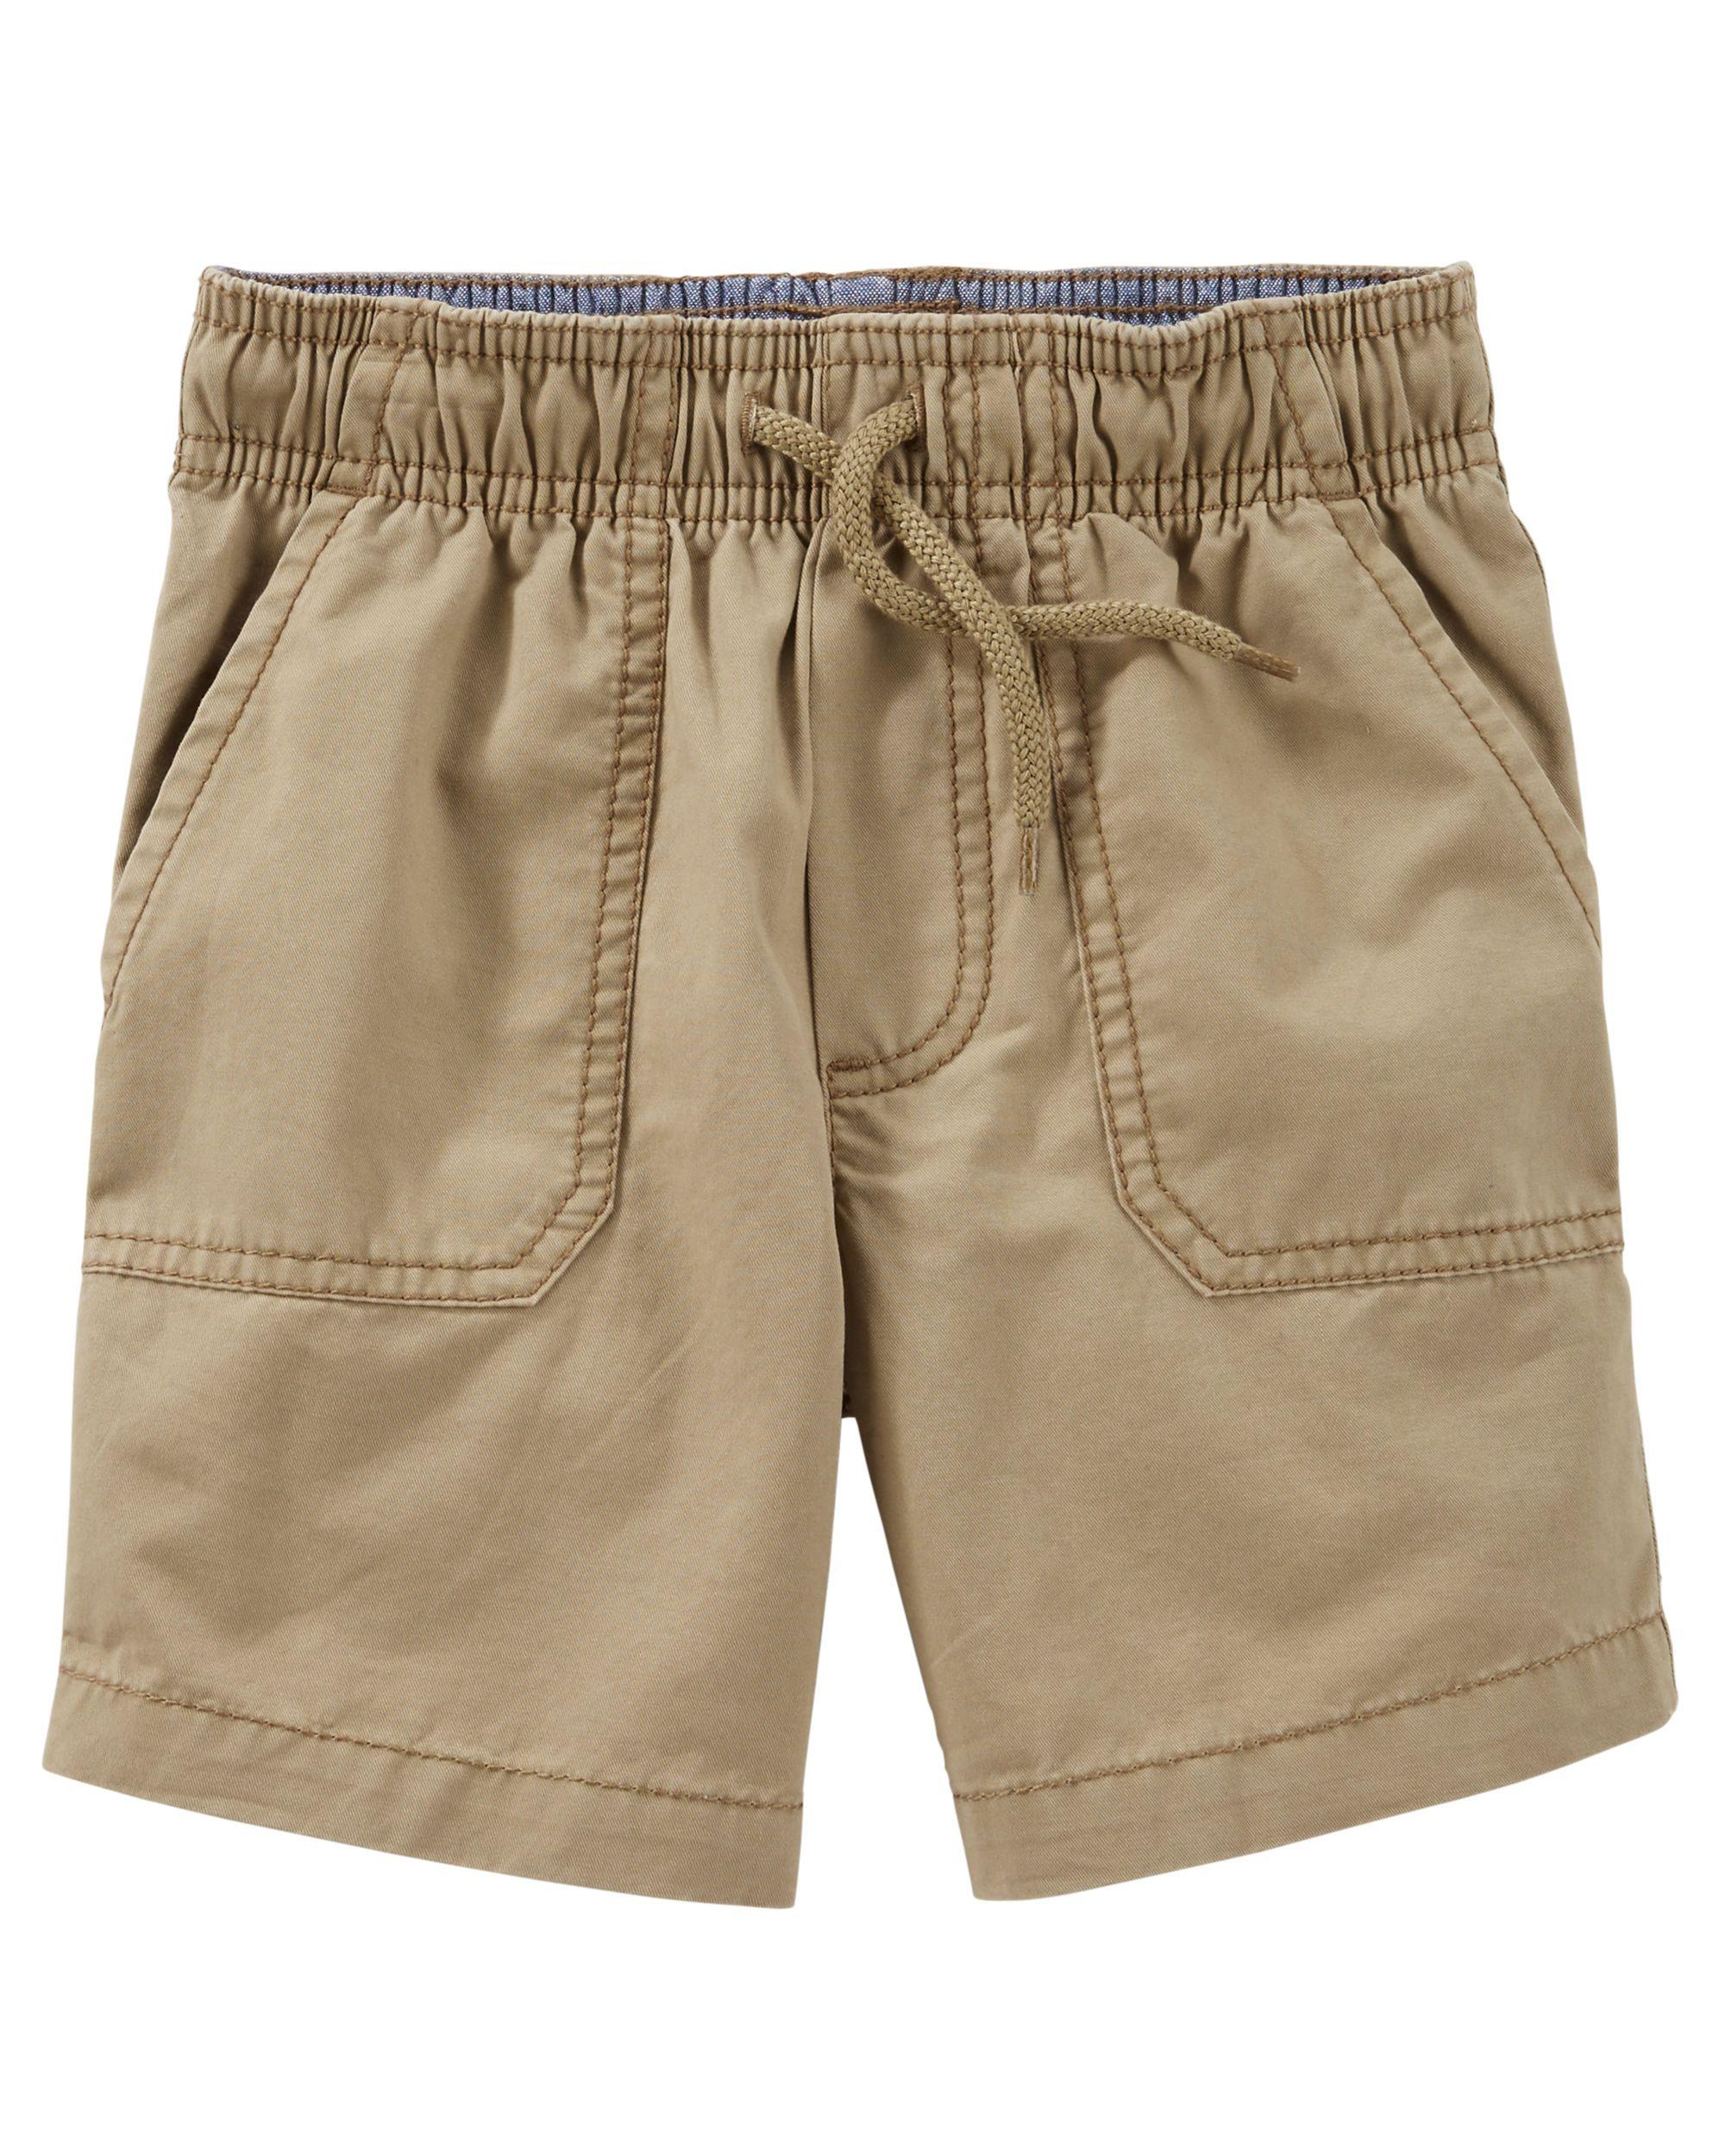 OshKosh BGosh Boys Pull On Cargo Shorts